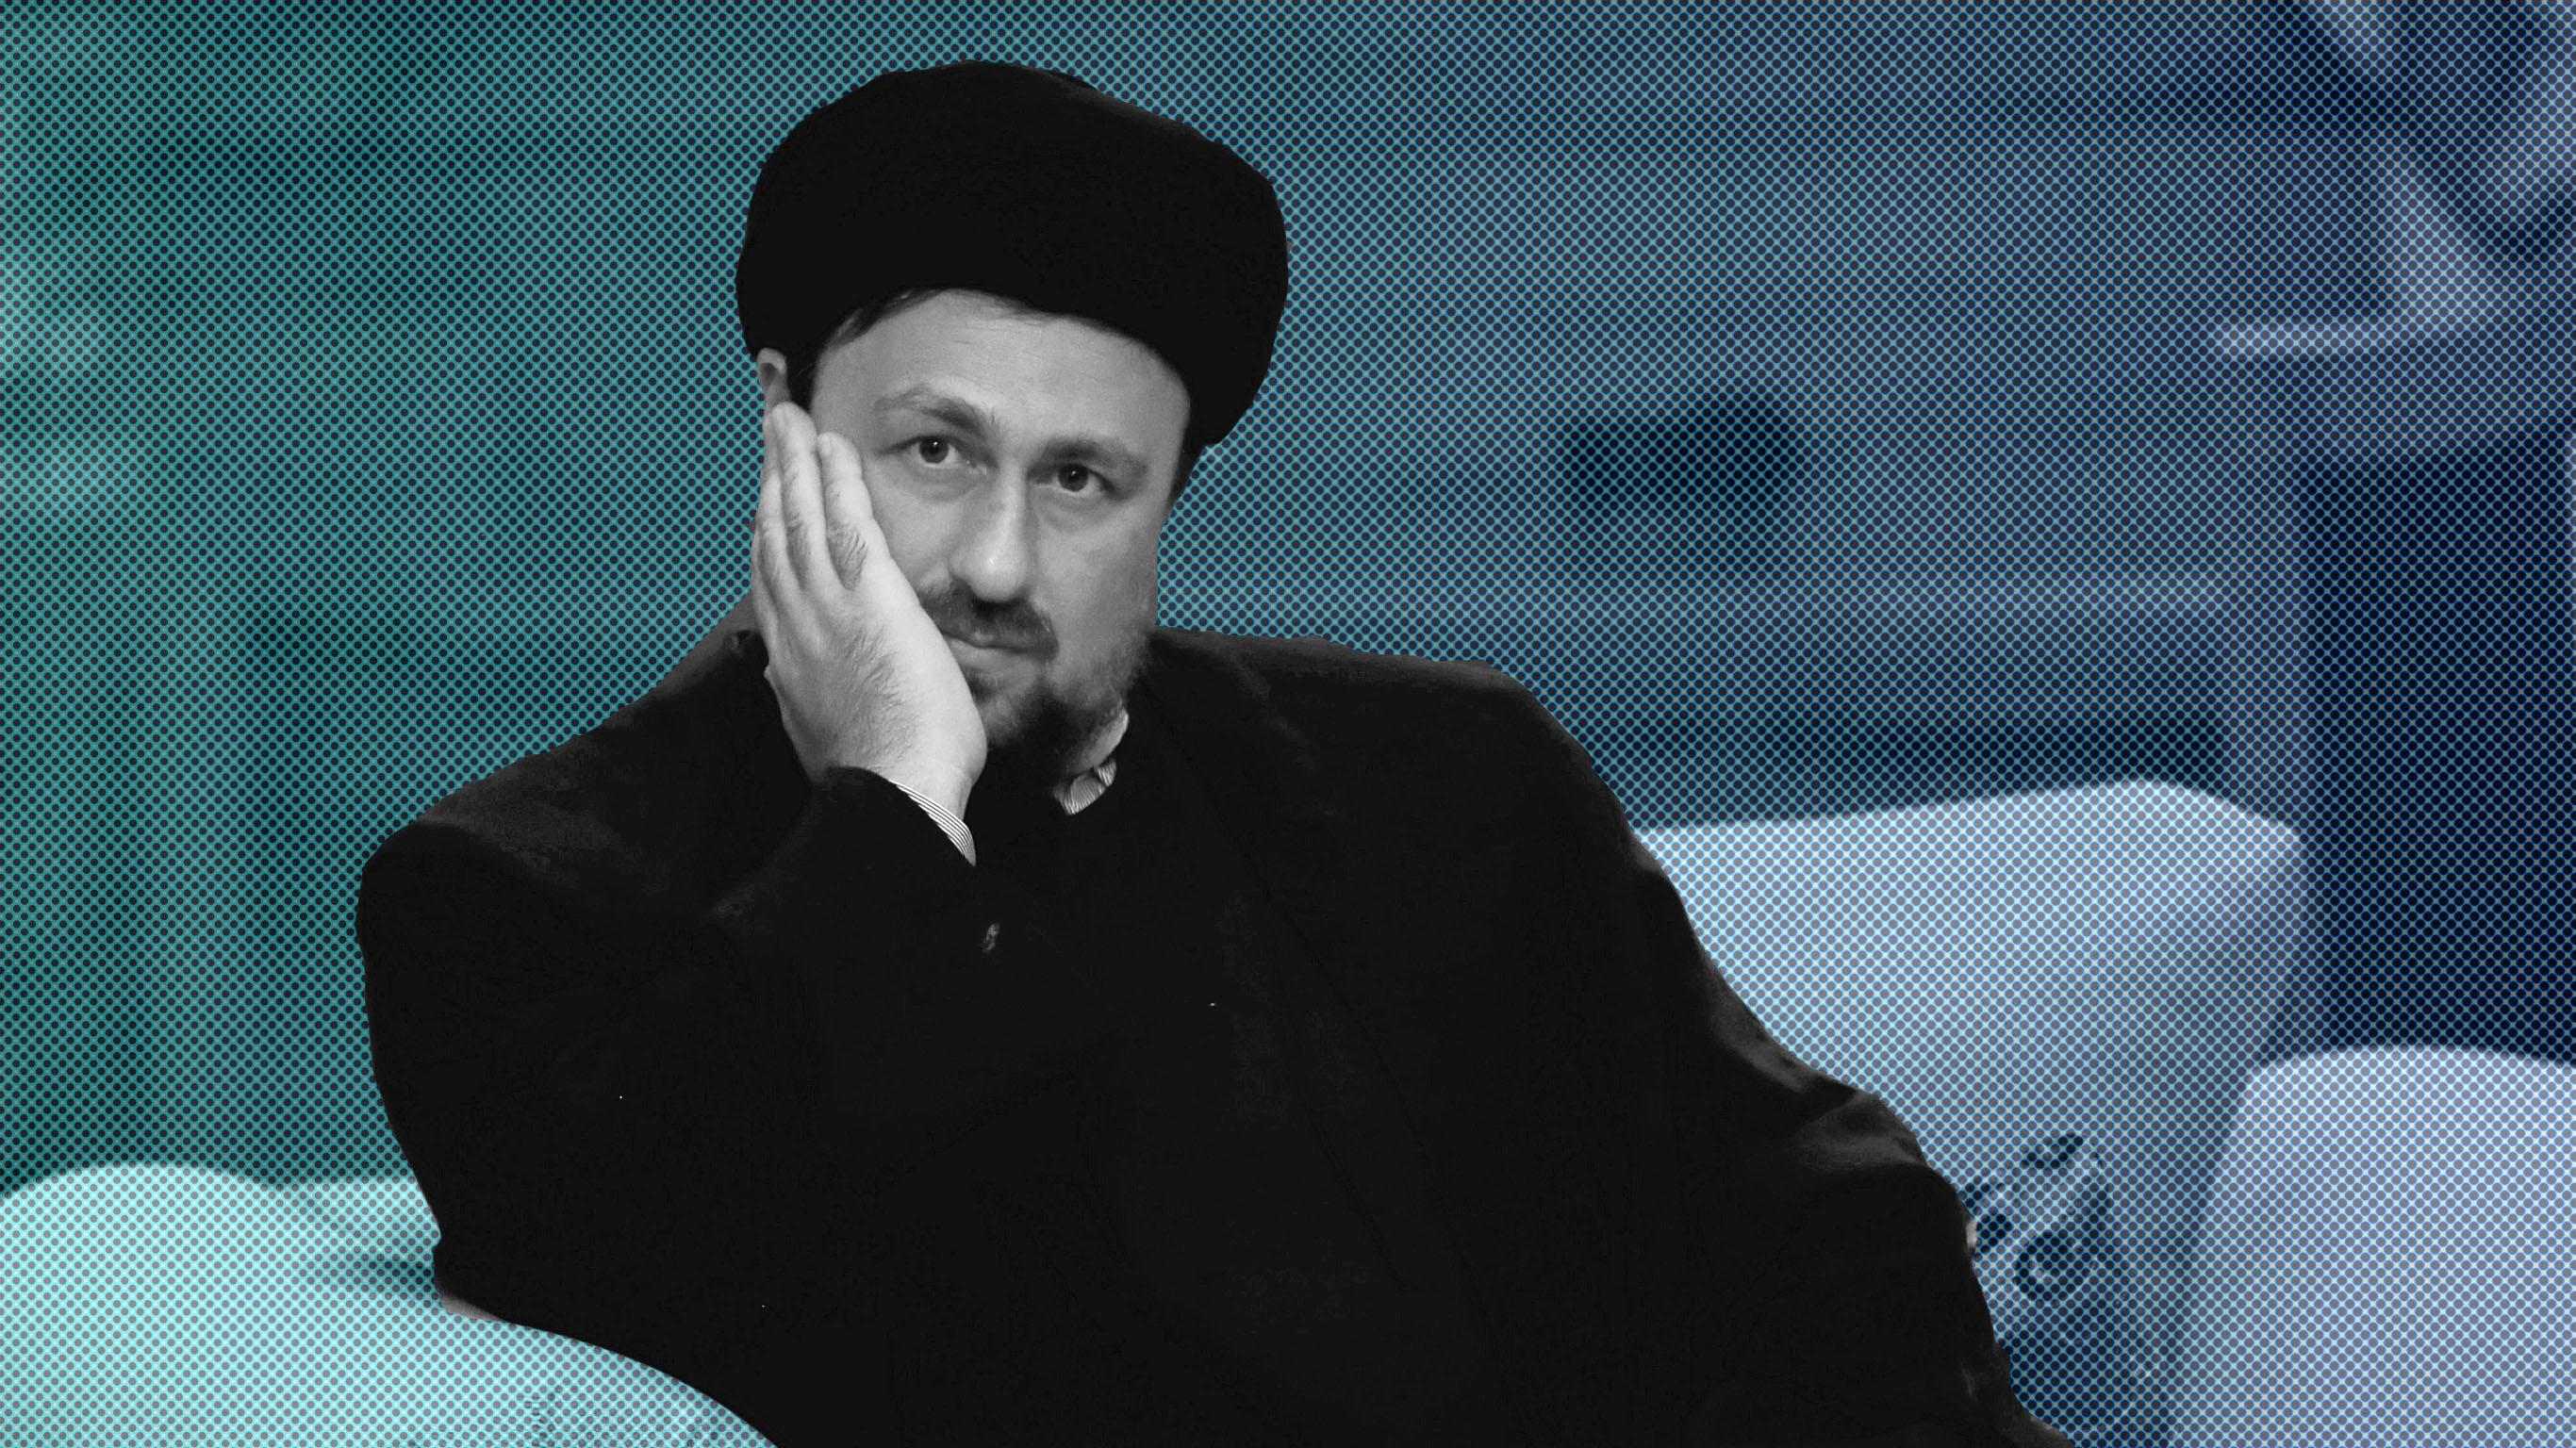 Hassan Khomeini